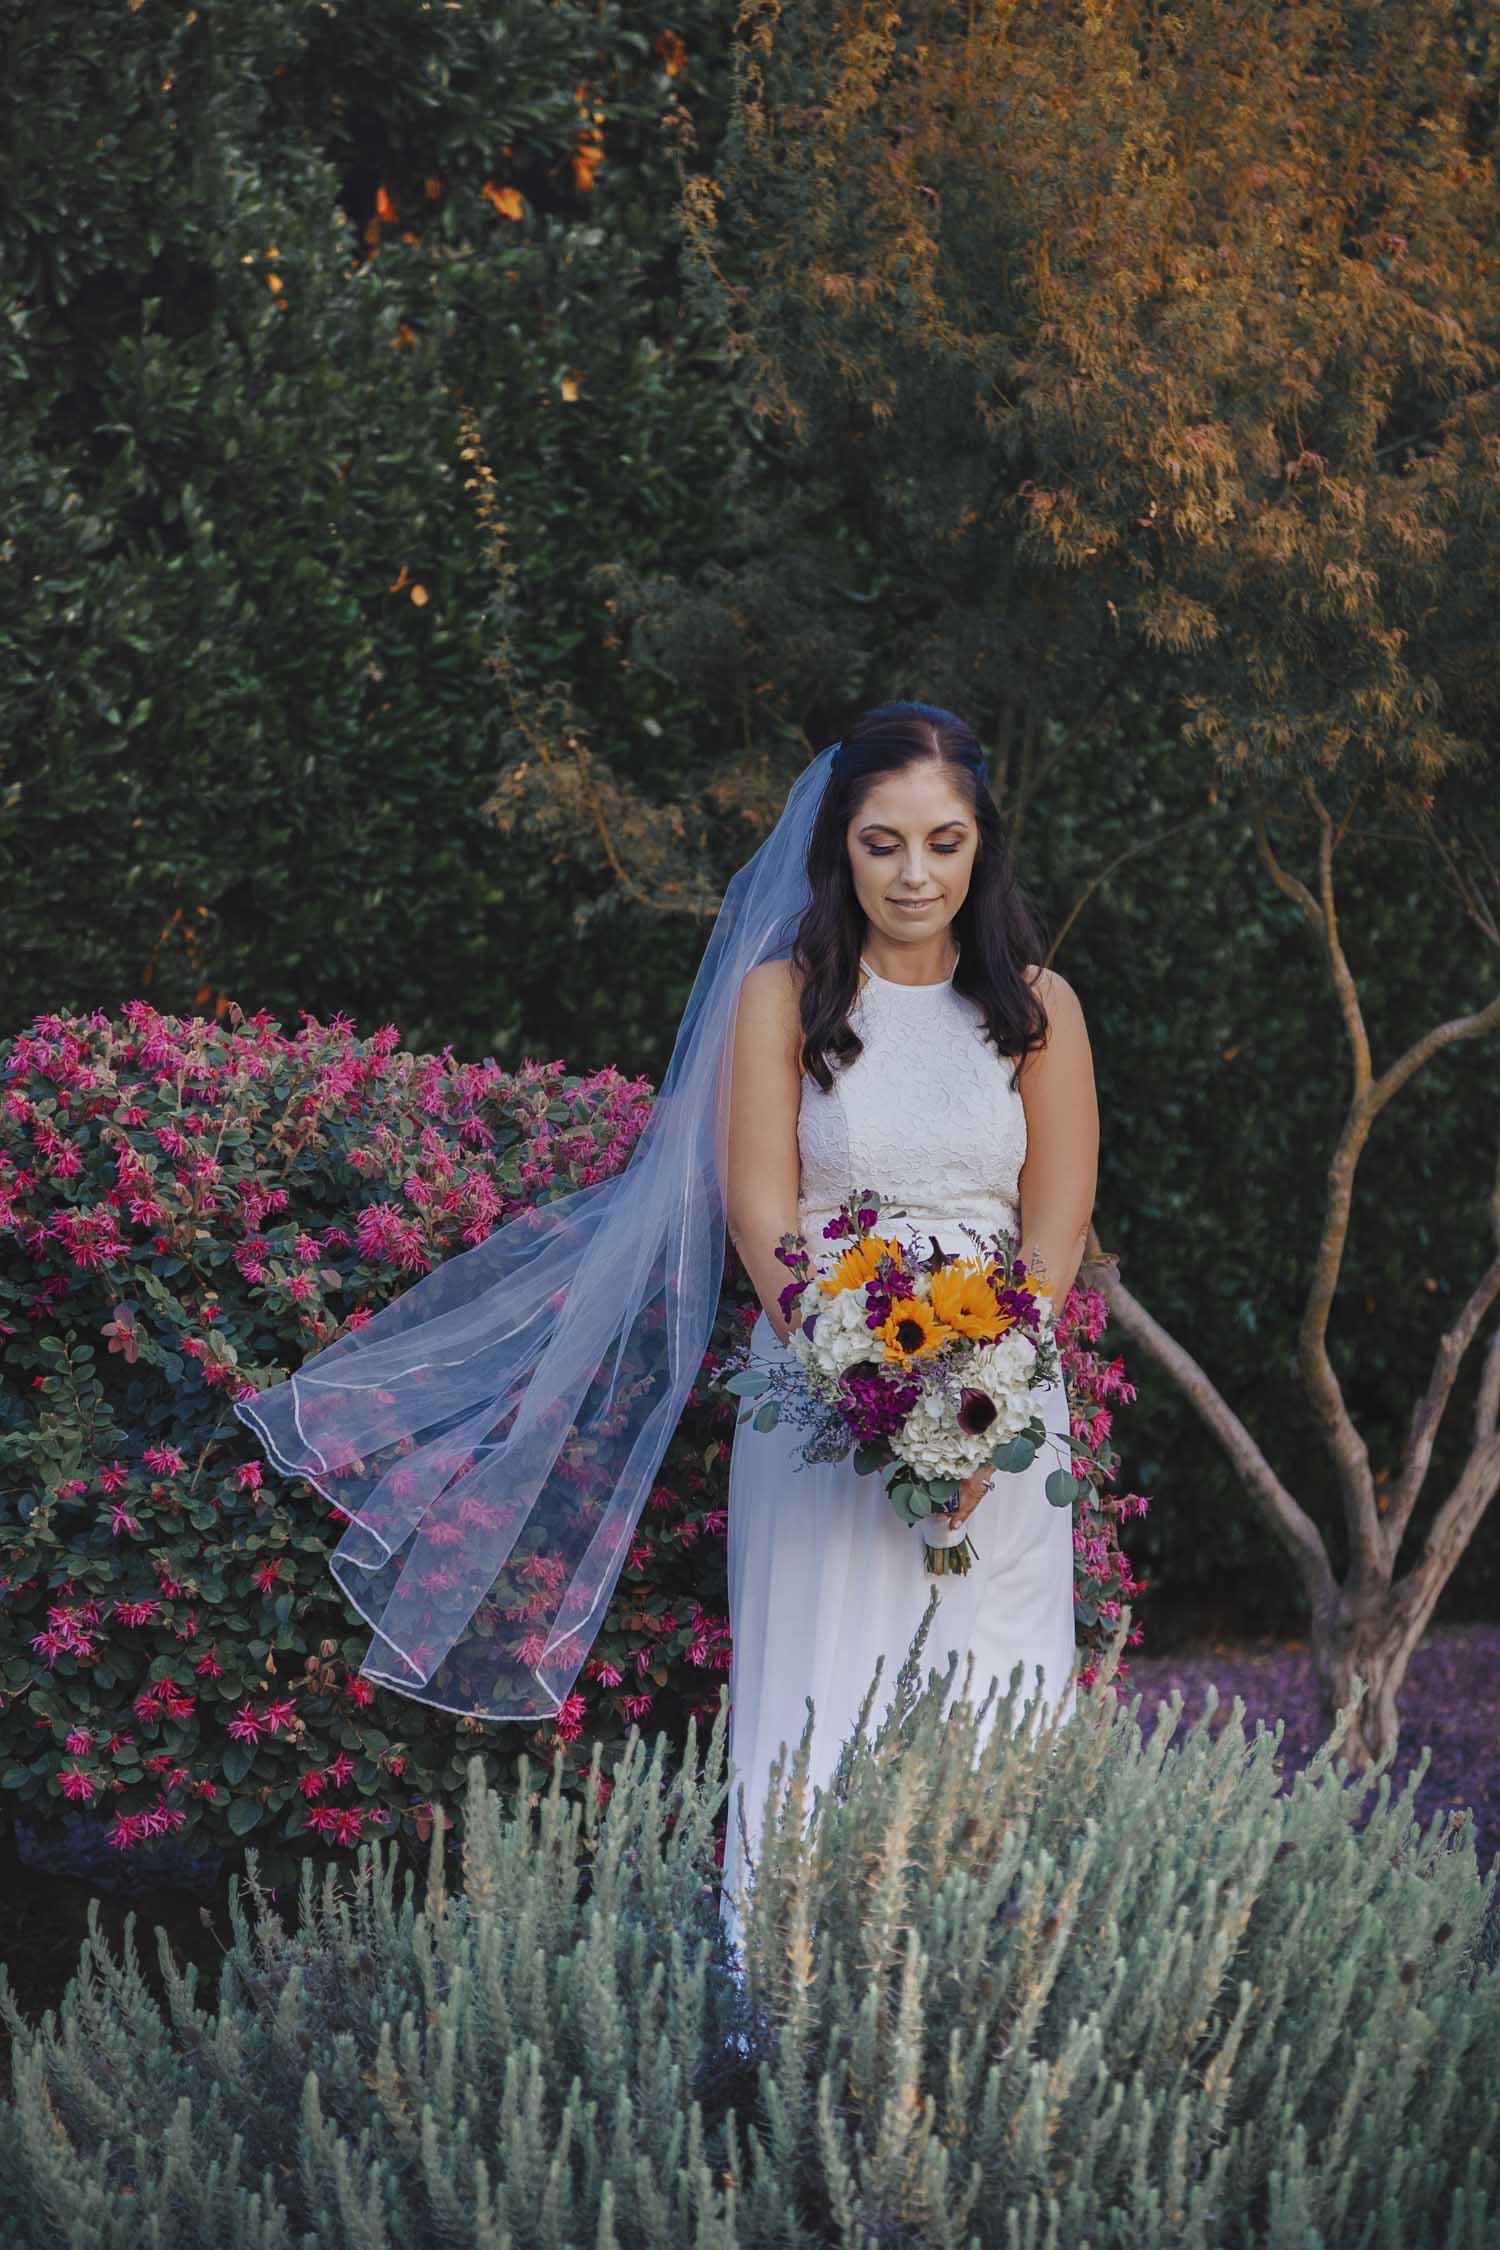 Bonnie-Scott-Rustic-Wedding-Chico-Ca-Butte-Creek-Country-Club246.jpg